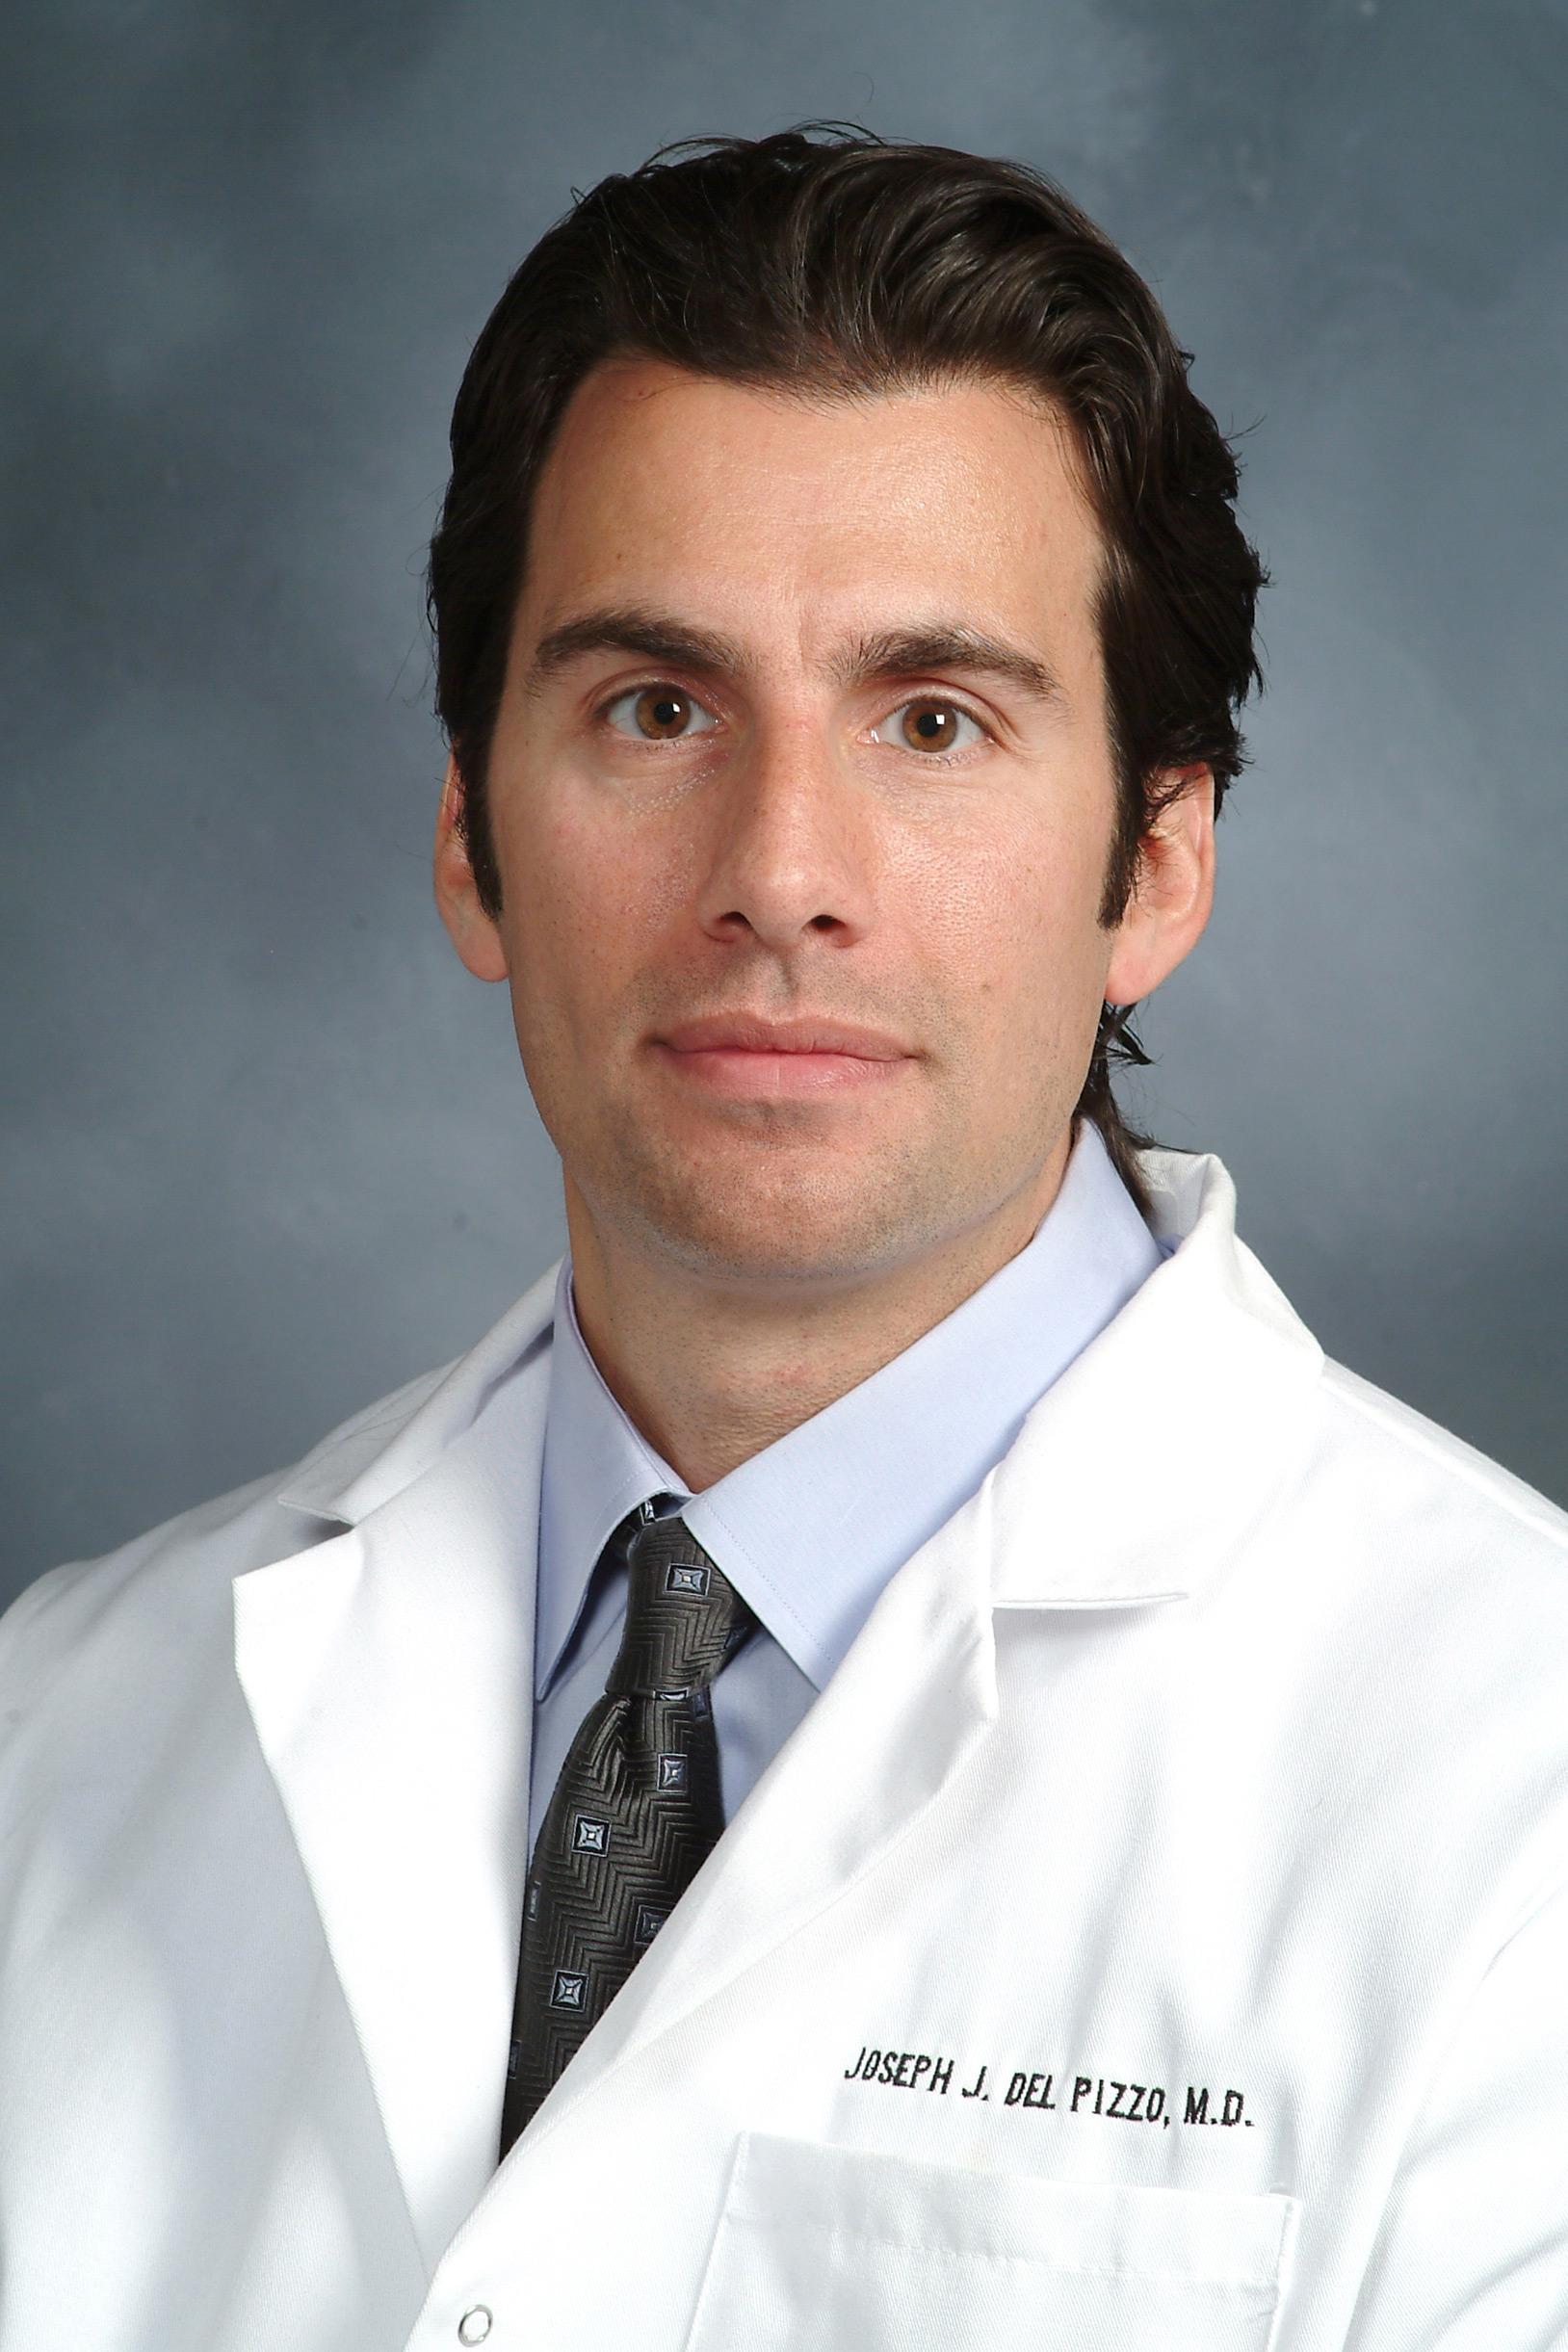 Dr. Joseph Del Pizzo, M.D.